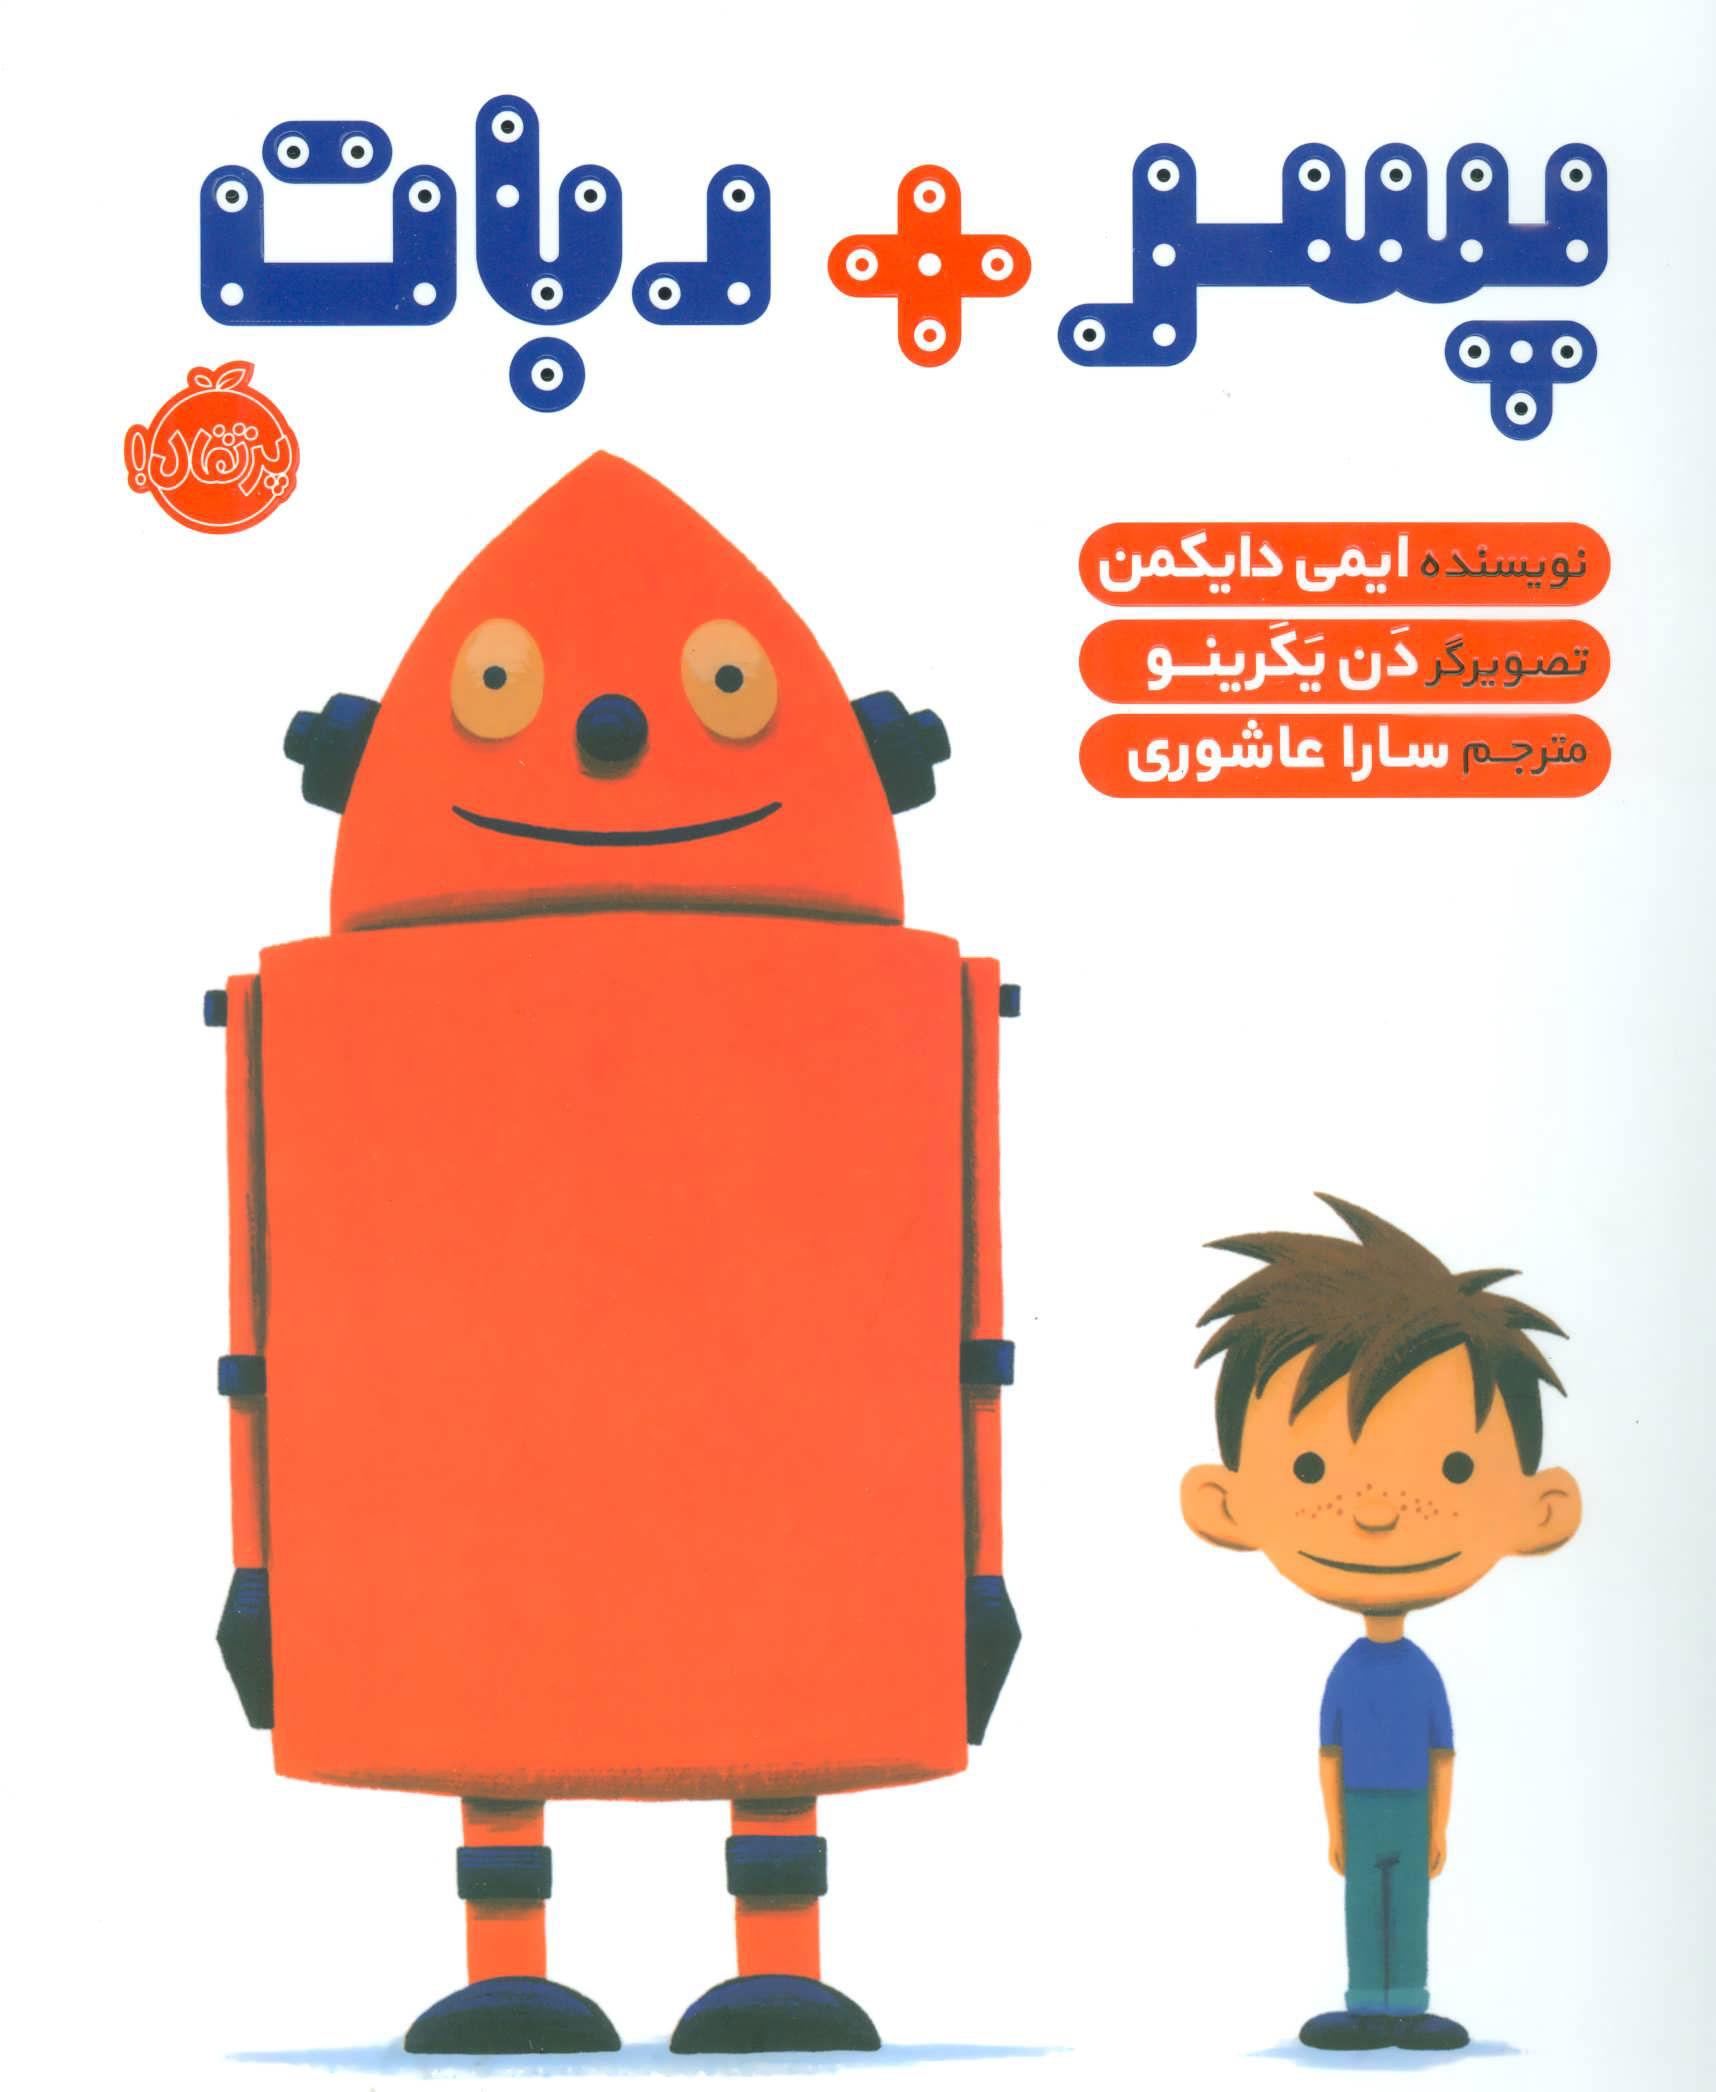 کتاب پسر + ربات